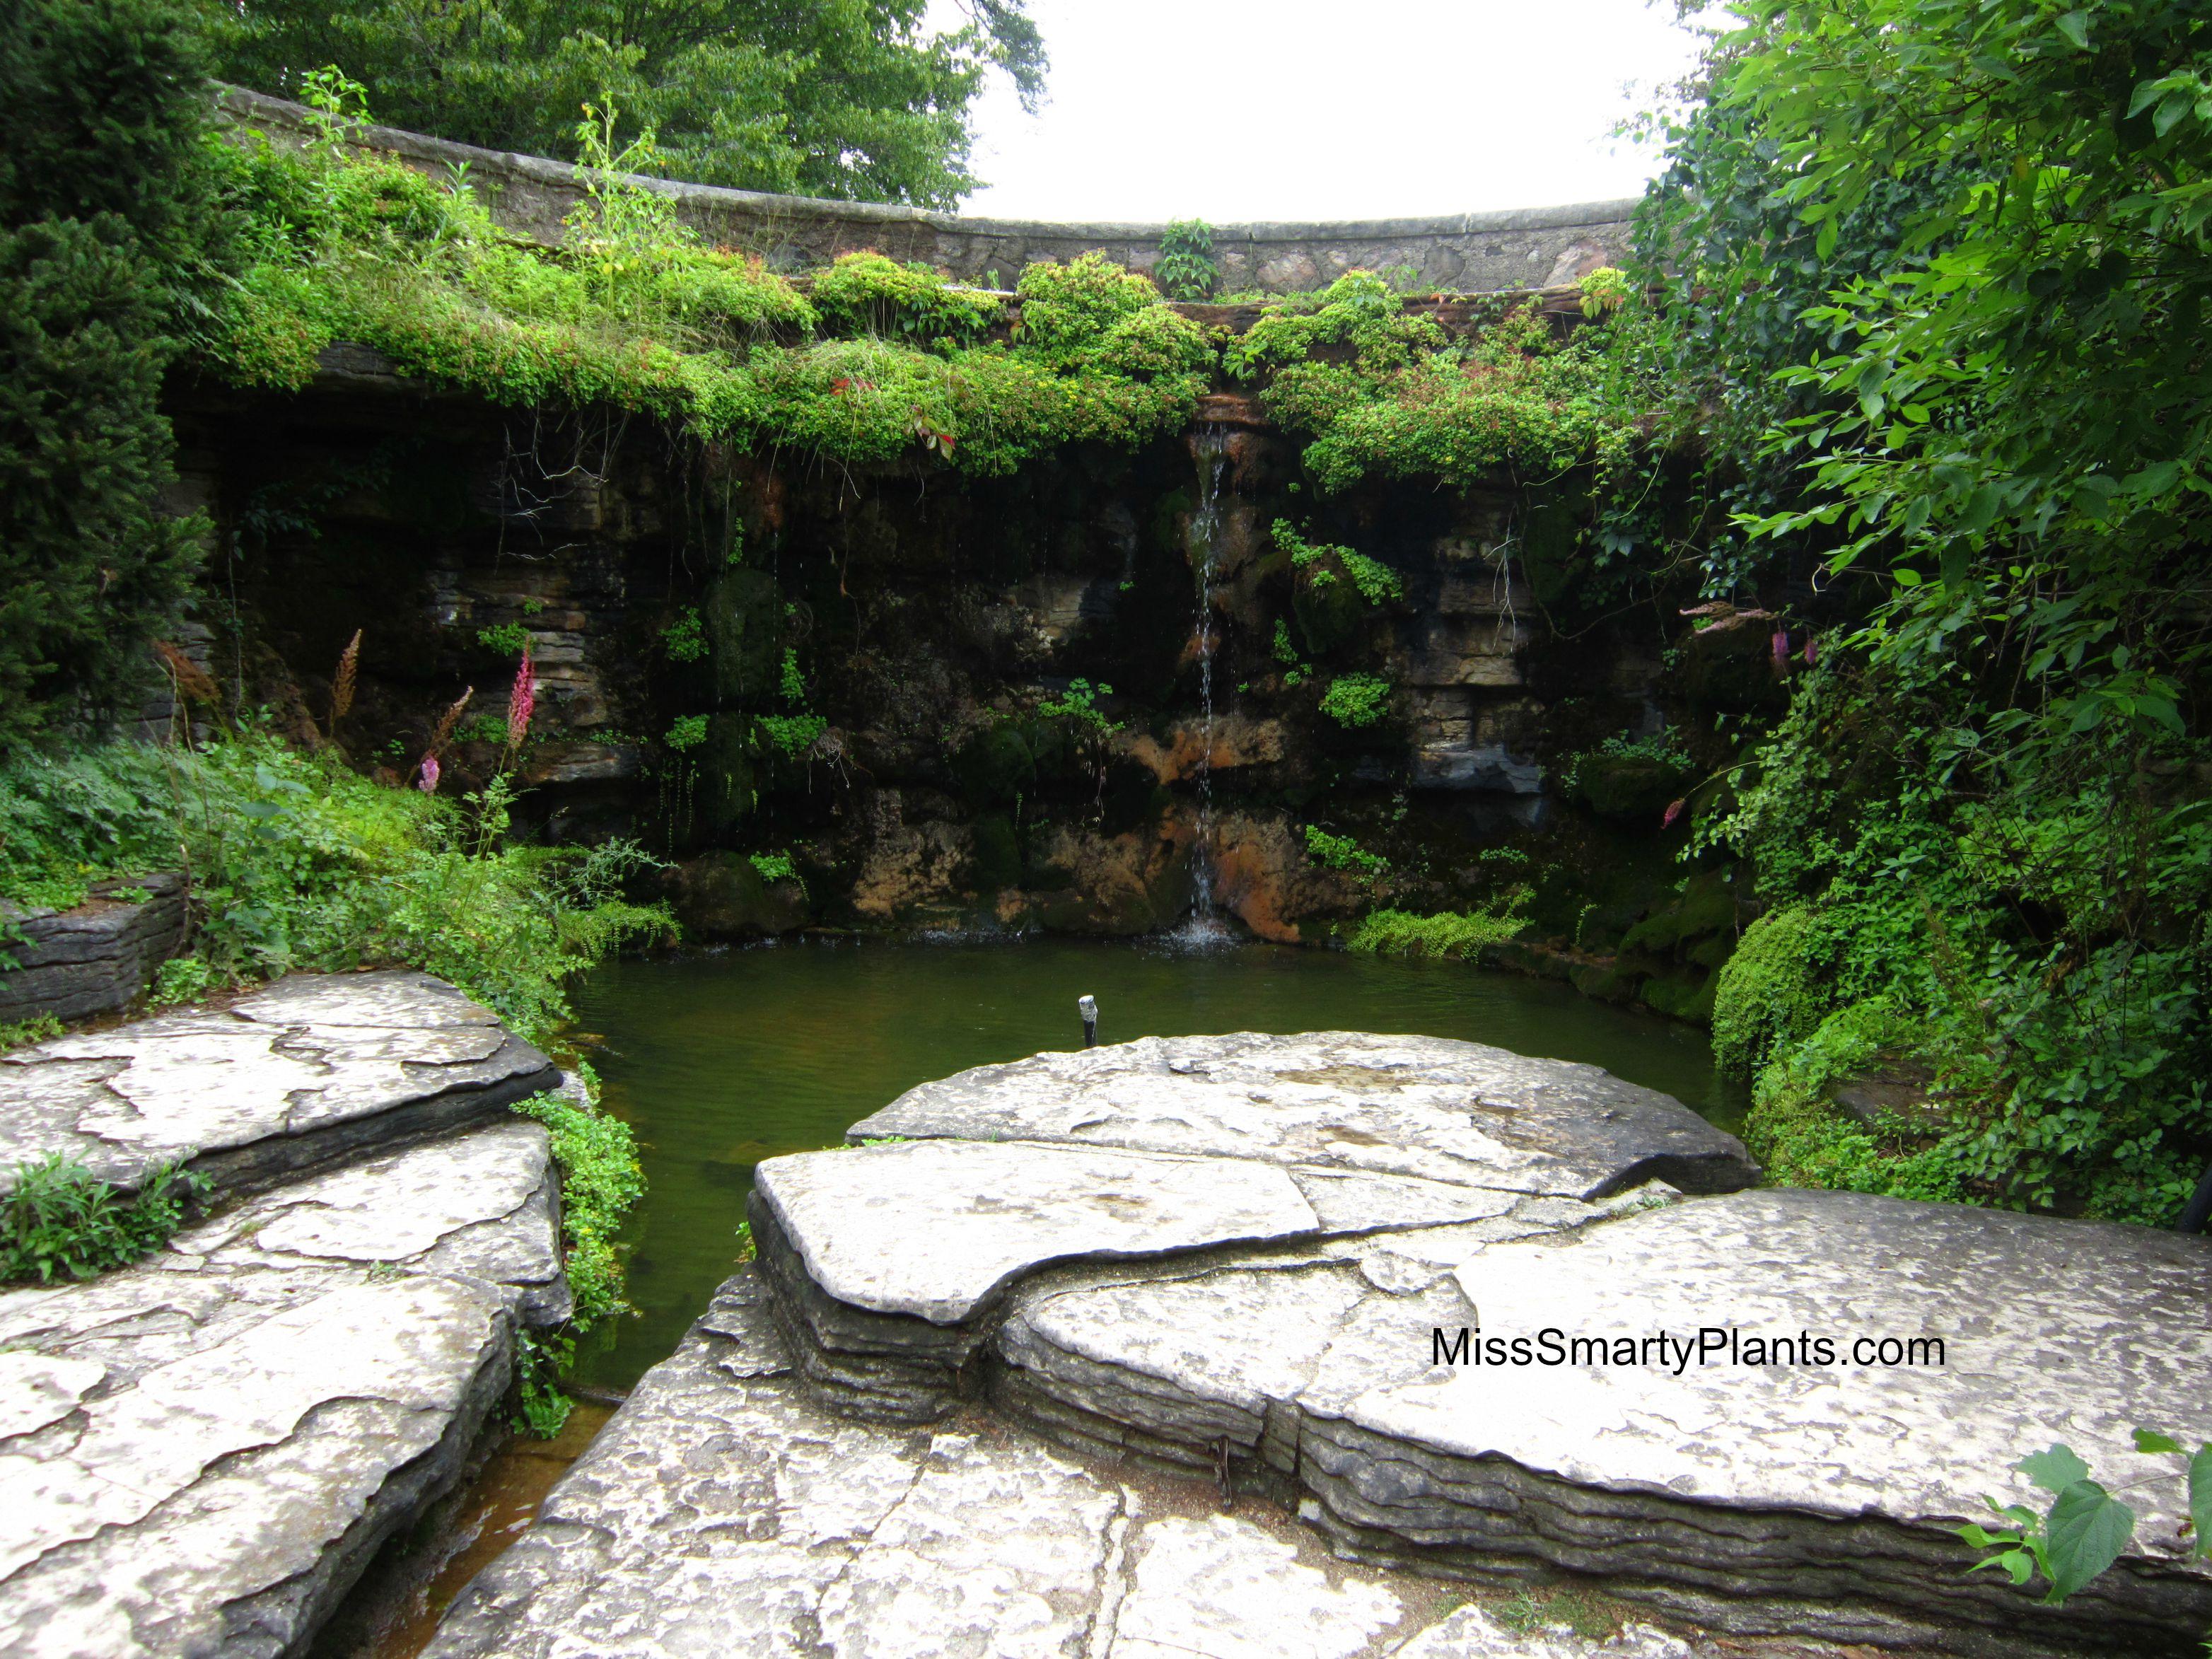 Delicieux Boerner Botanical Garden Rock Garden